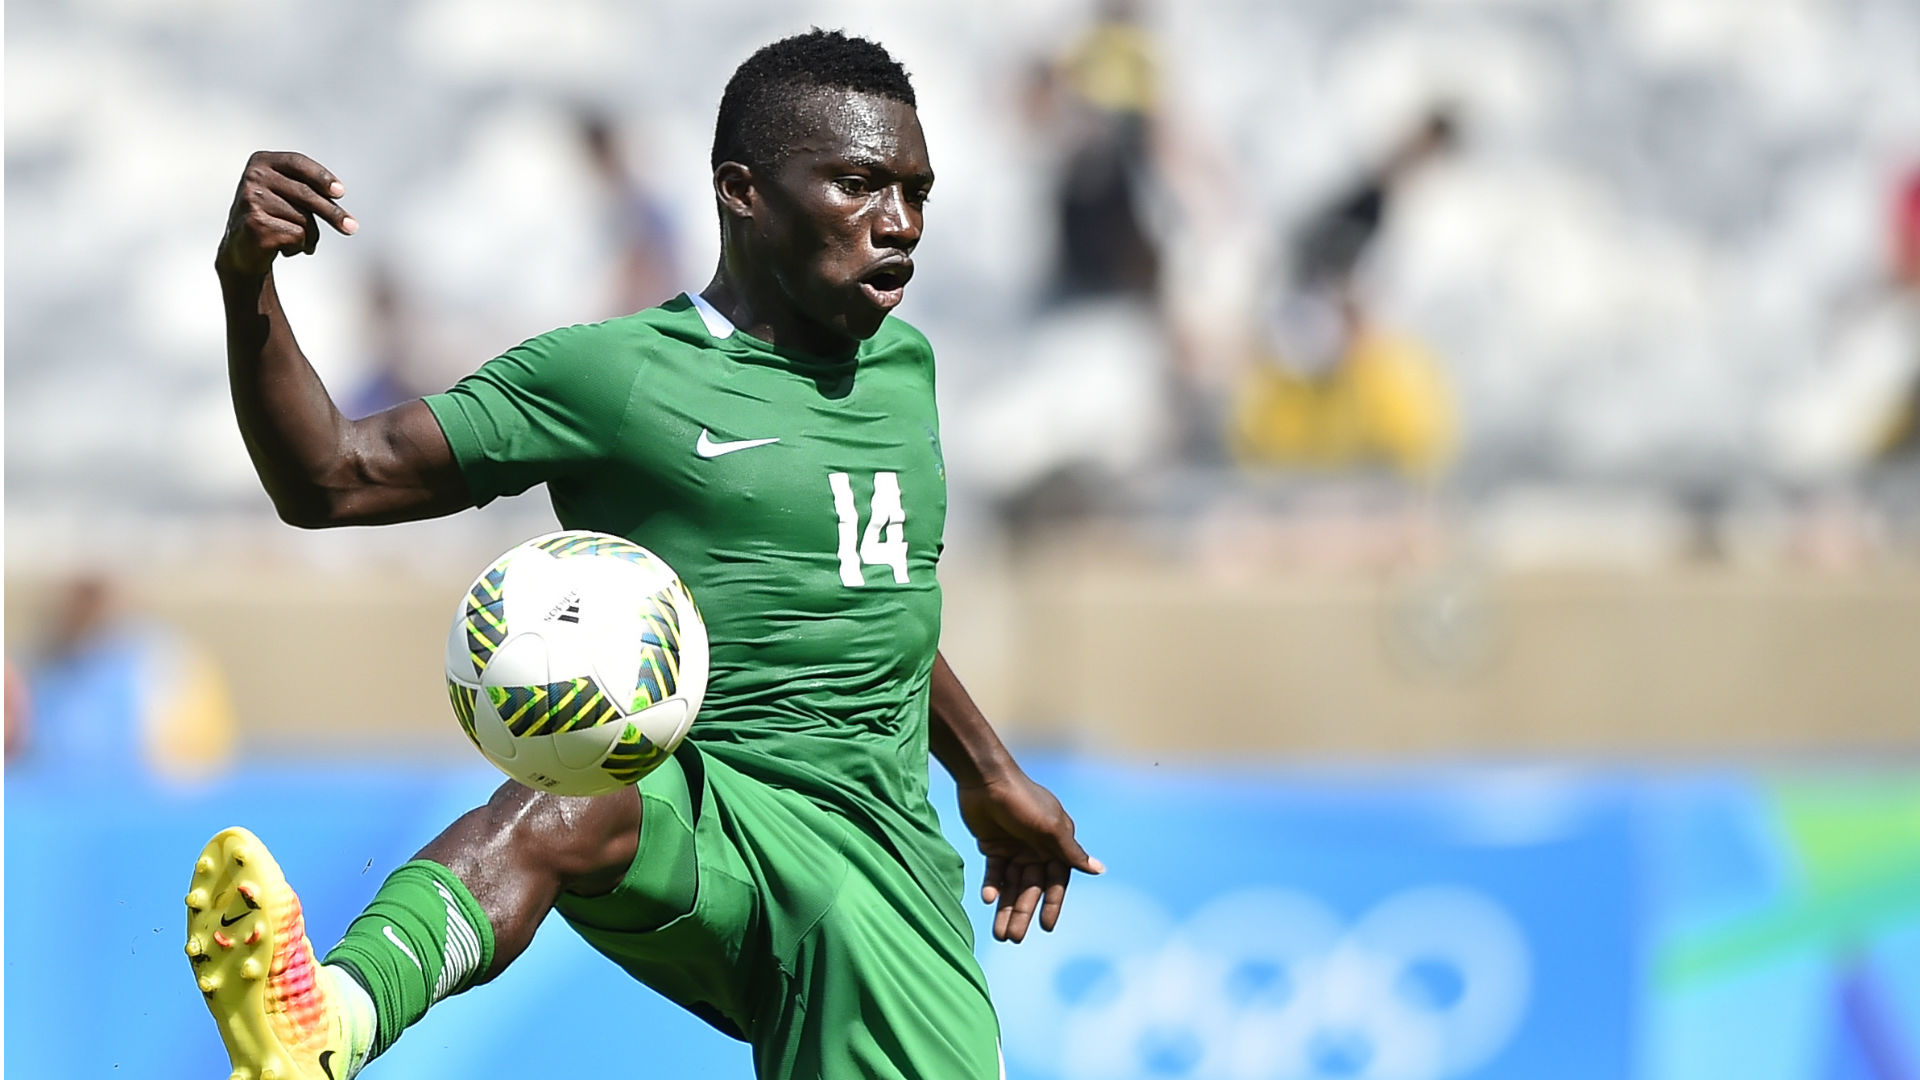 Nigeria's Azubuike Okechukwu joins Istanbul Basaksehir on loan